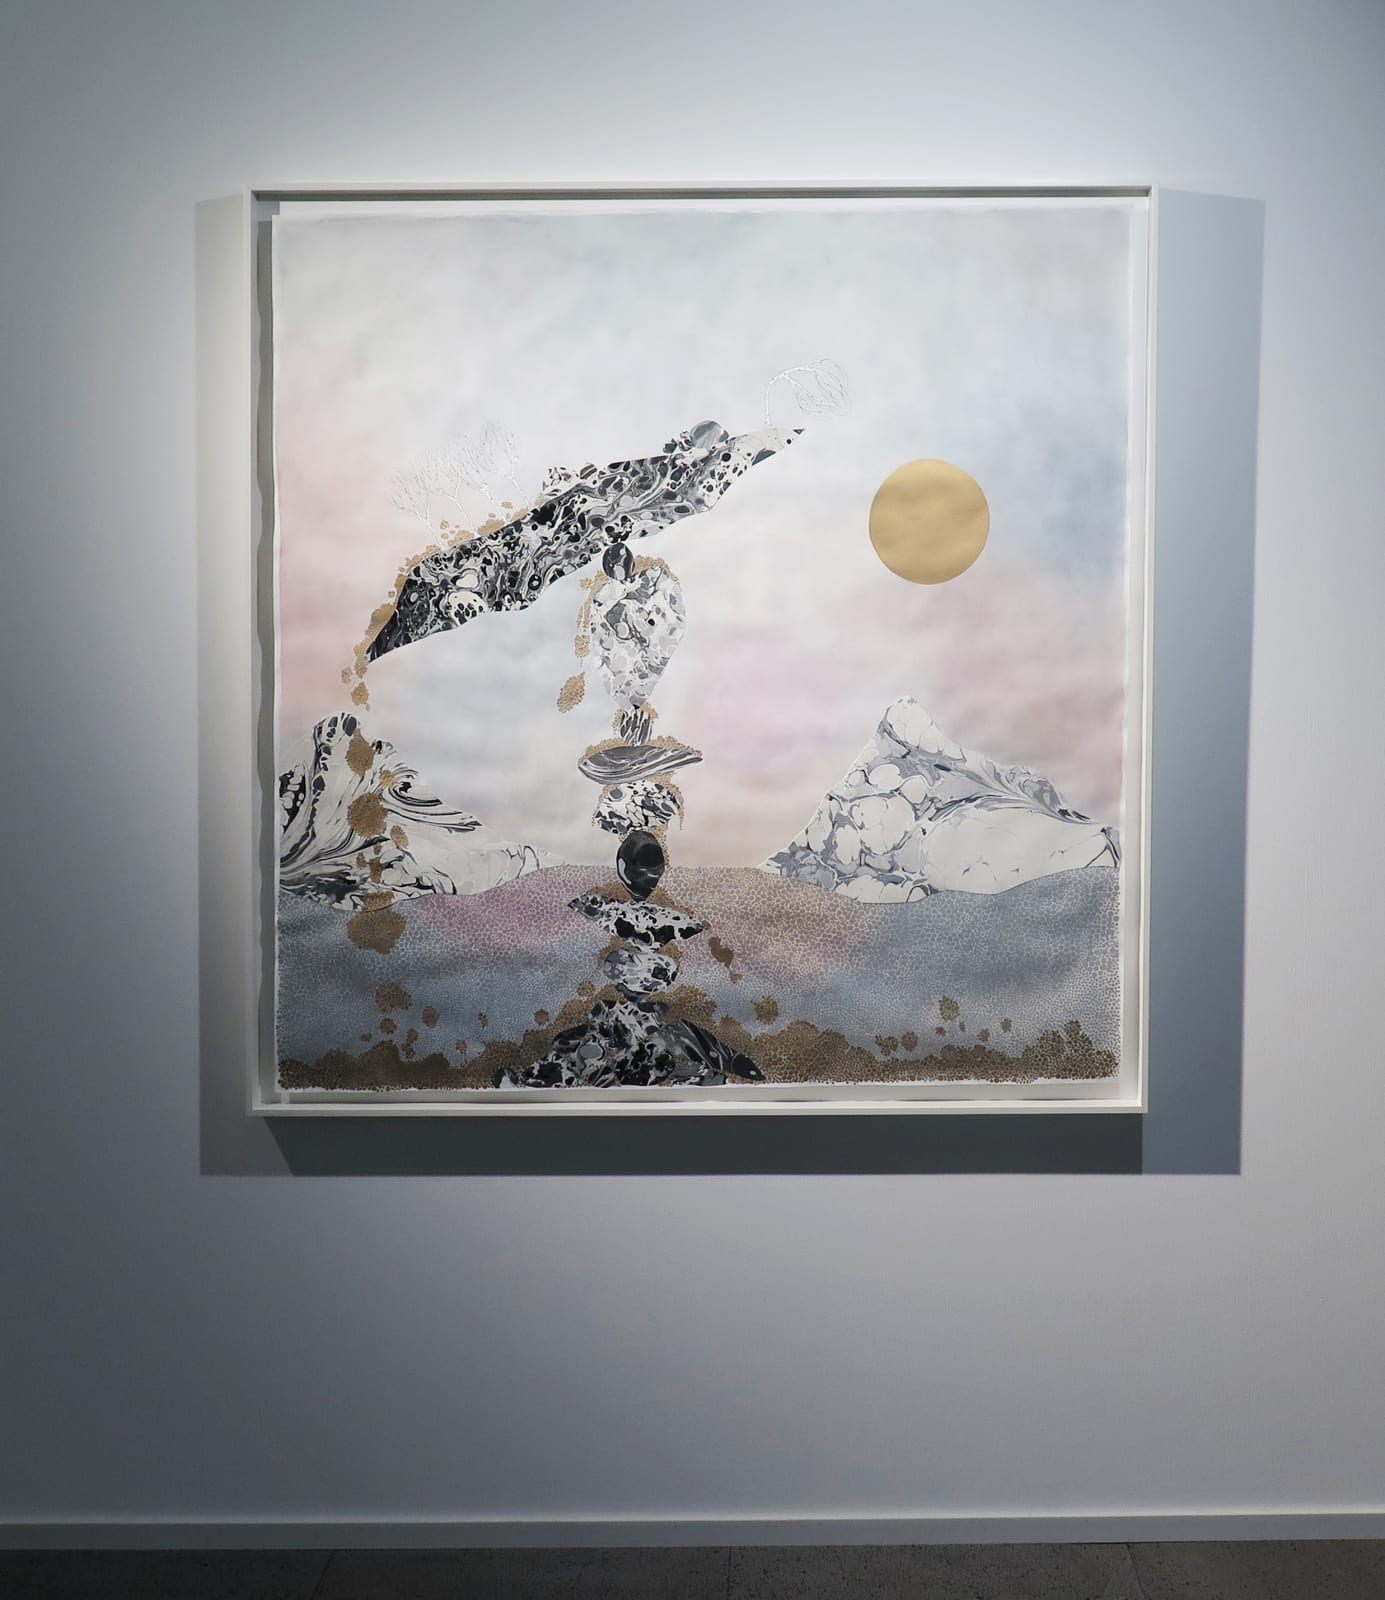 Crystal Liu, the mountains, 'i'll take you there', 2017